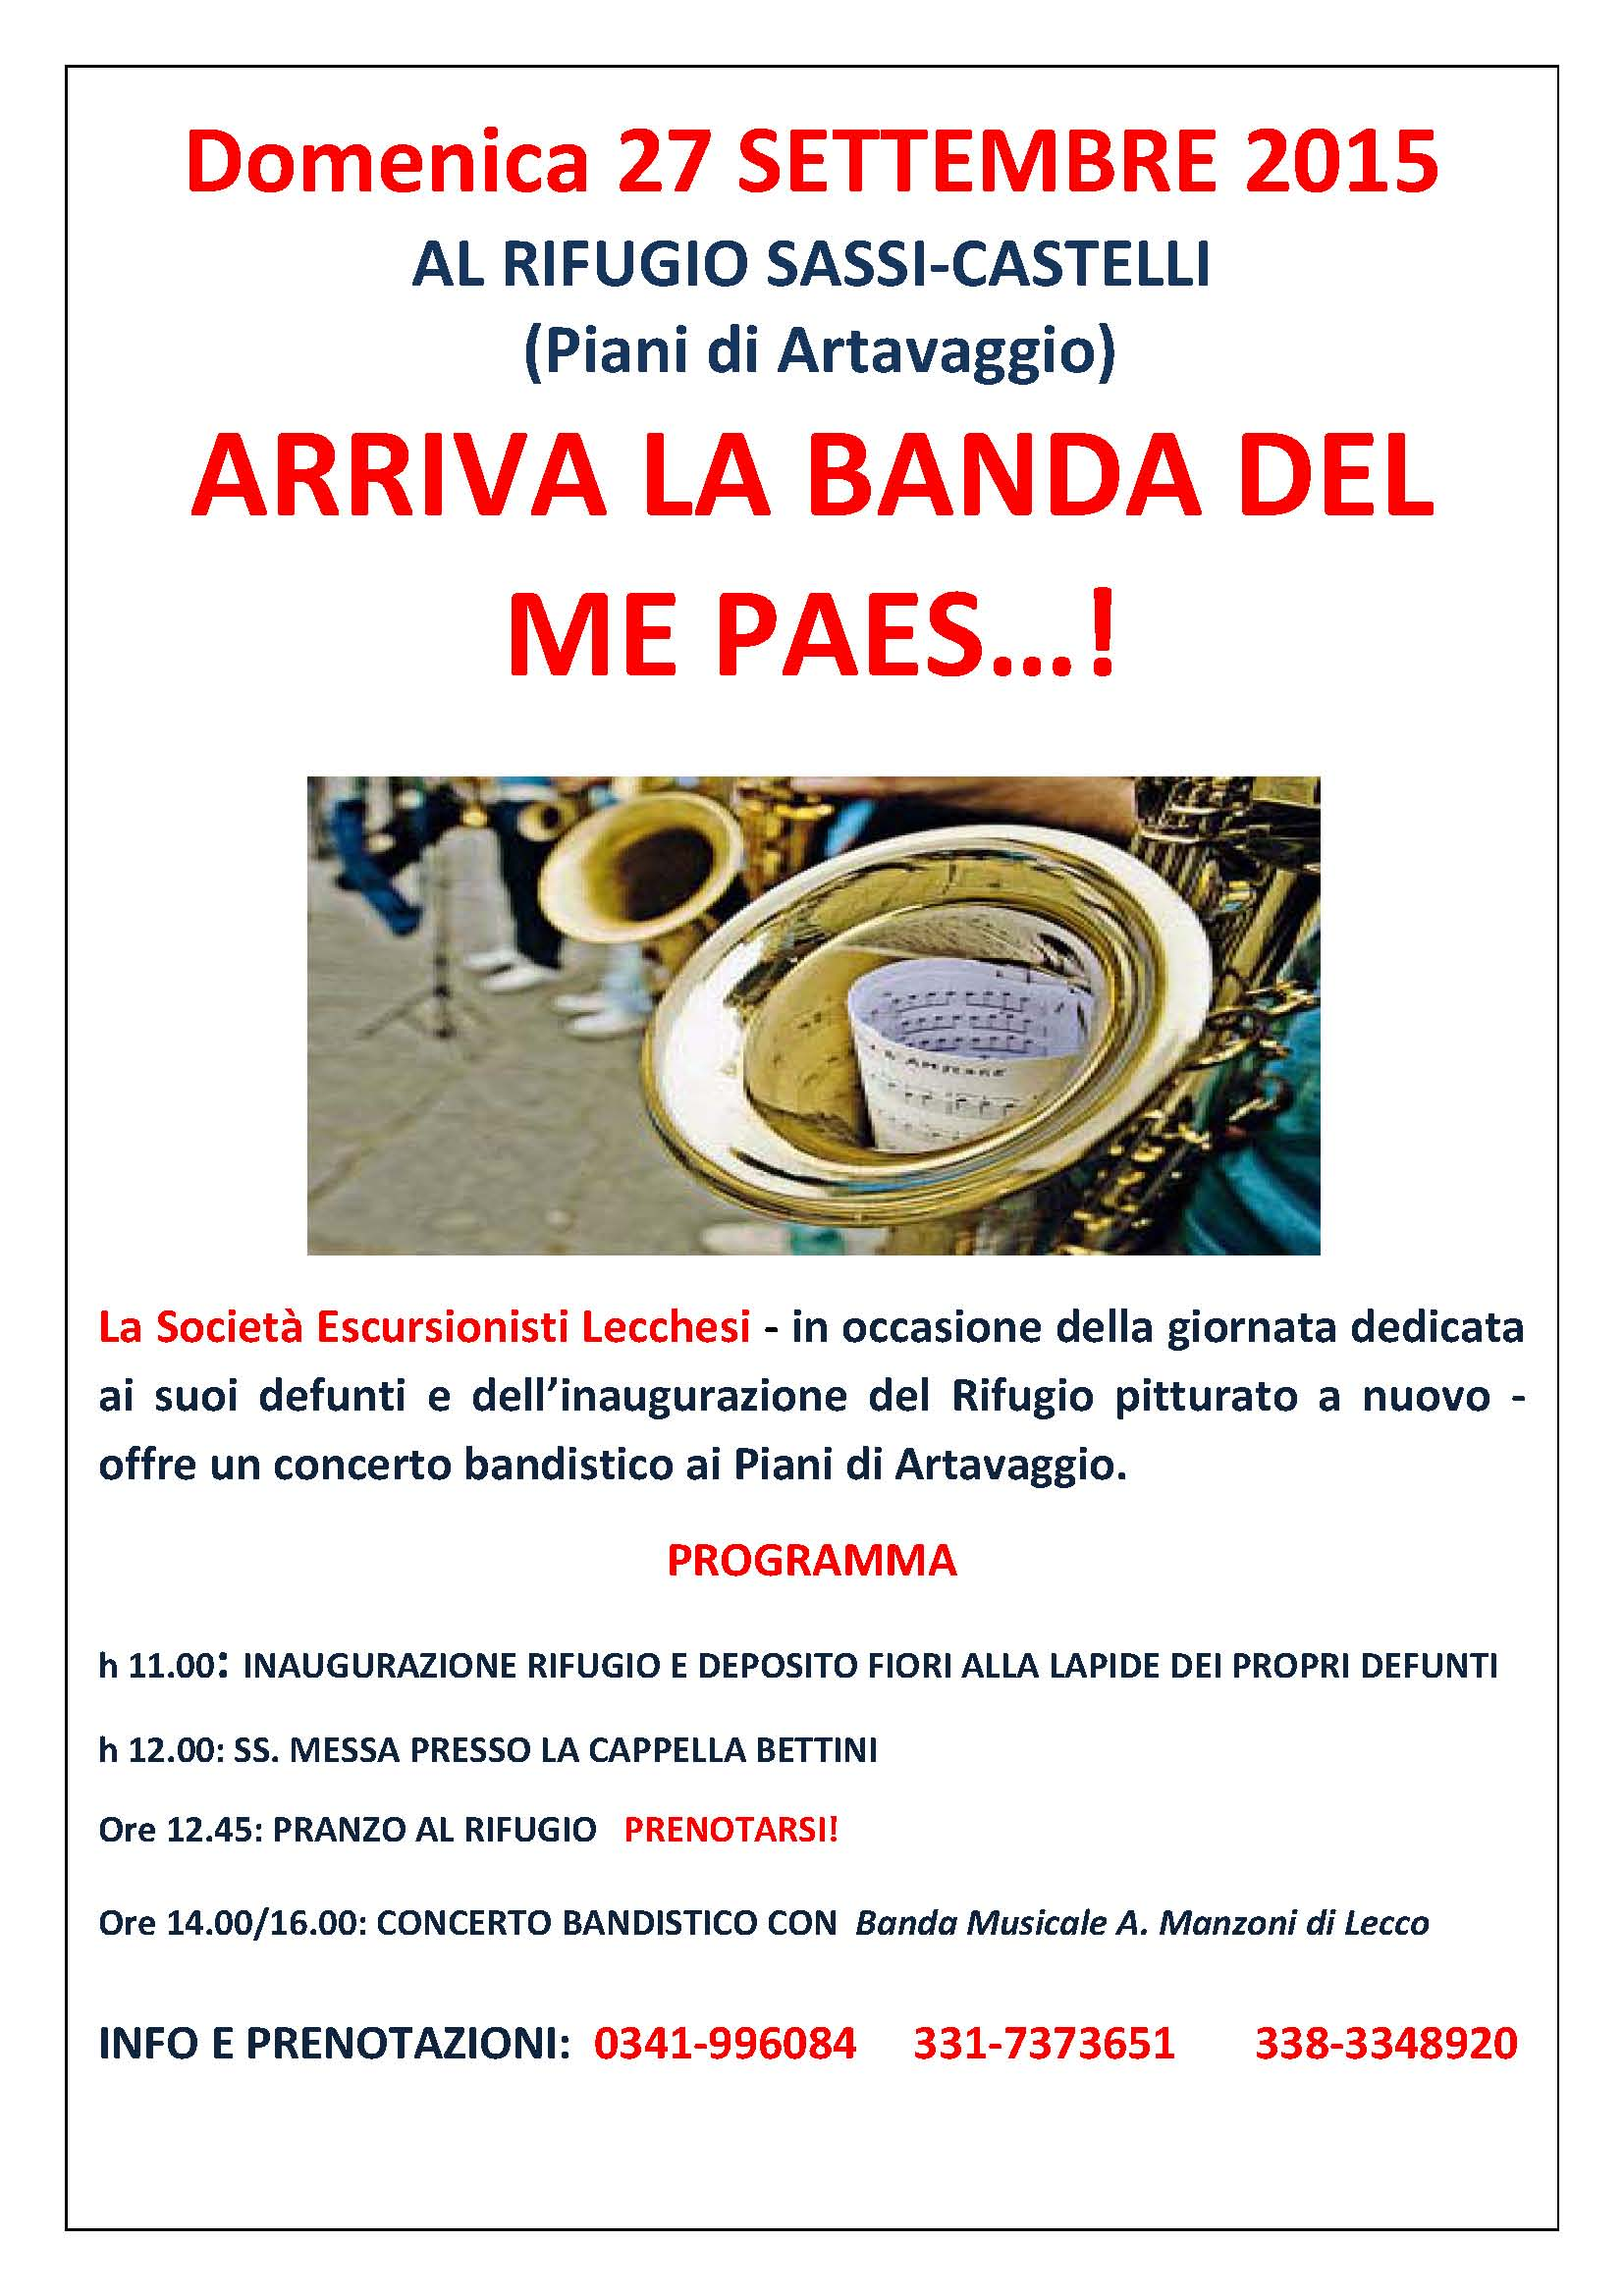 iniziative al Sassi Castelli_Pagina_1